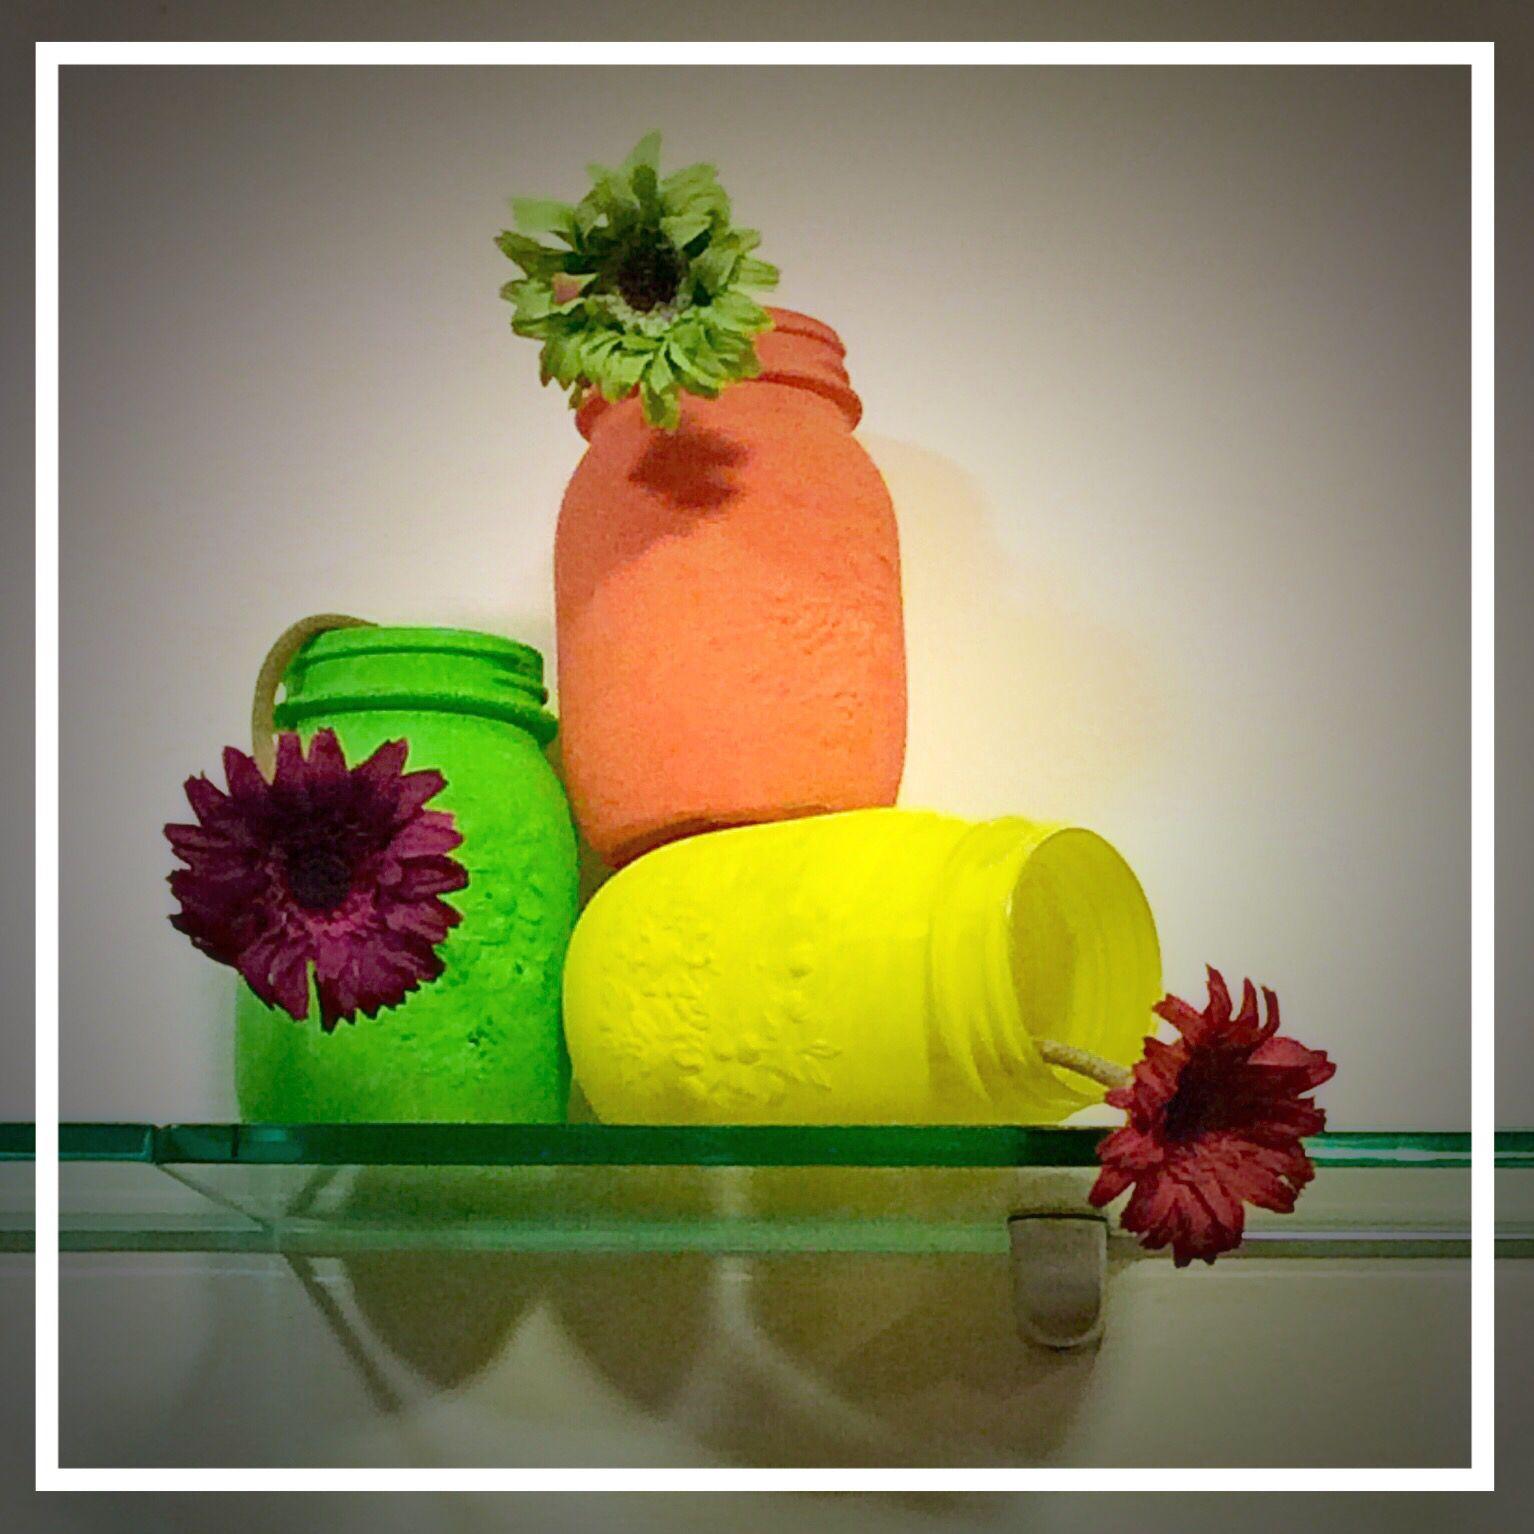 Estate @Hair Studio Consuelo  #allestimentiàporter #vetrineàporter #summer  #colour #flower #mkpretaporter #windowdisplay #visualmerchandising #ilovemywork